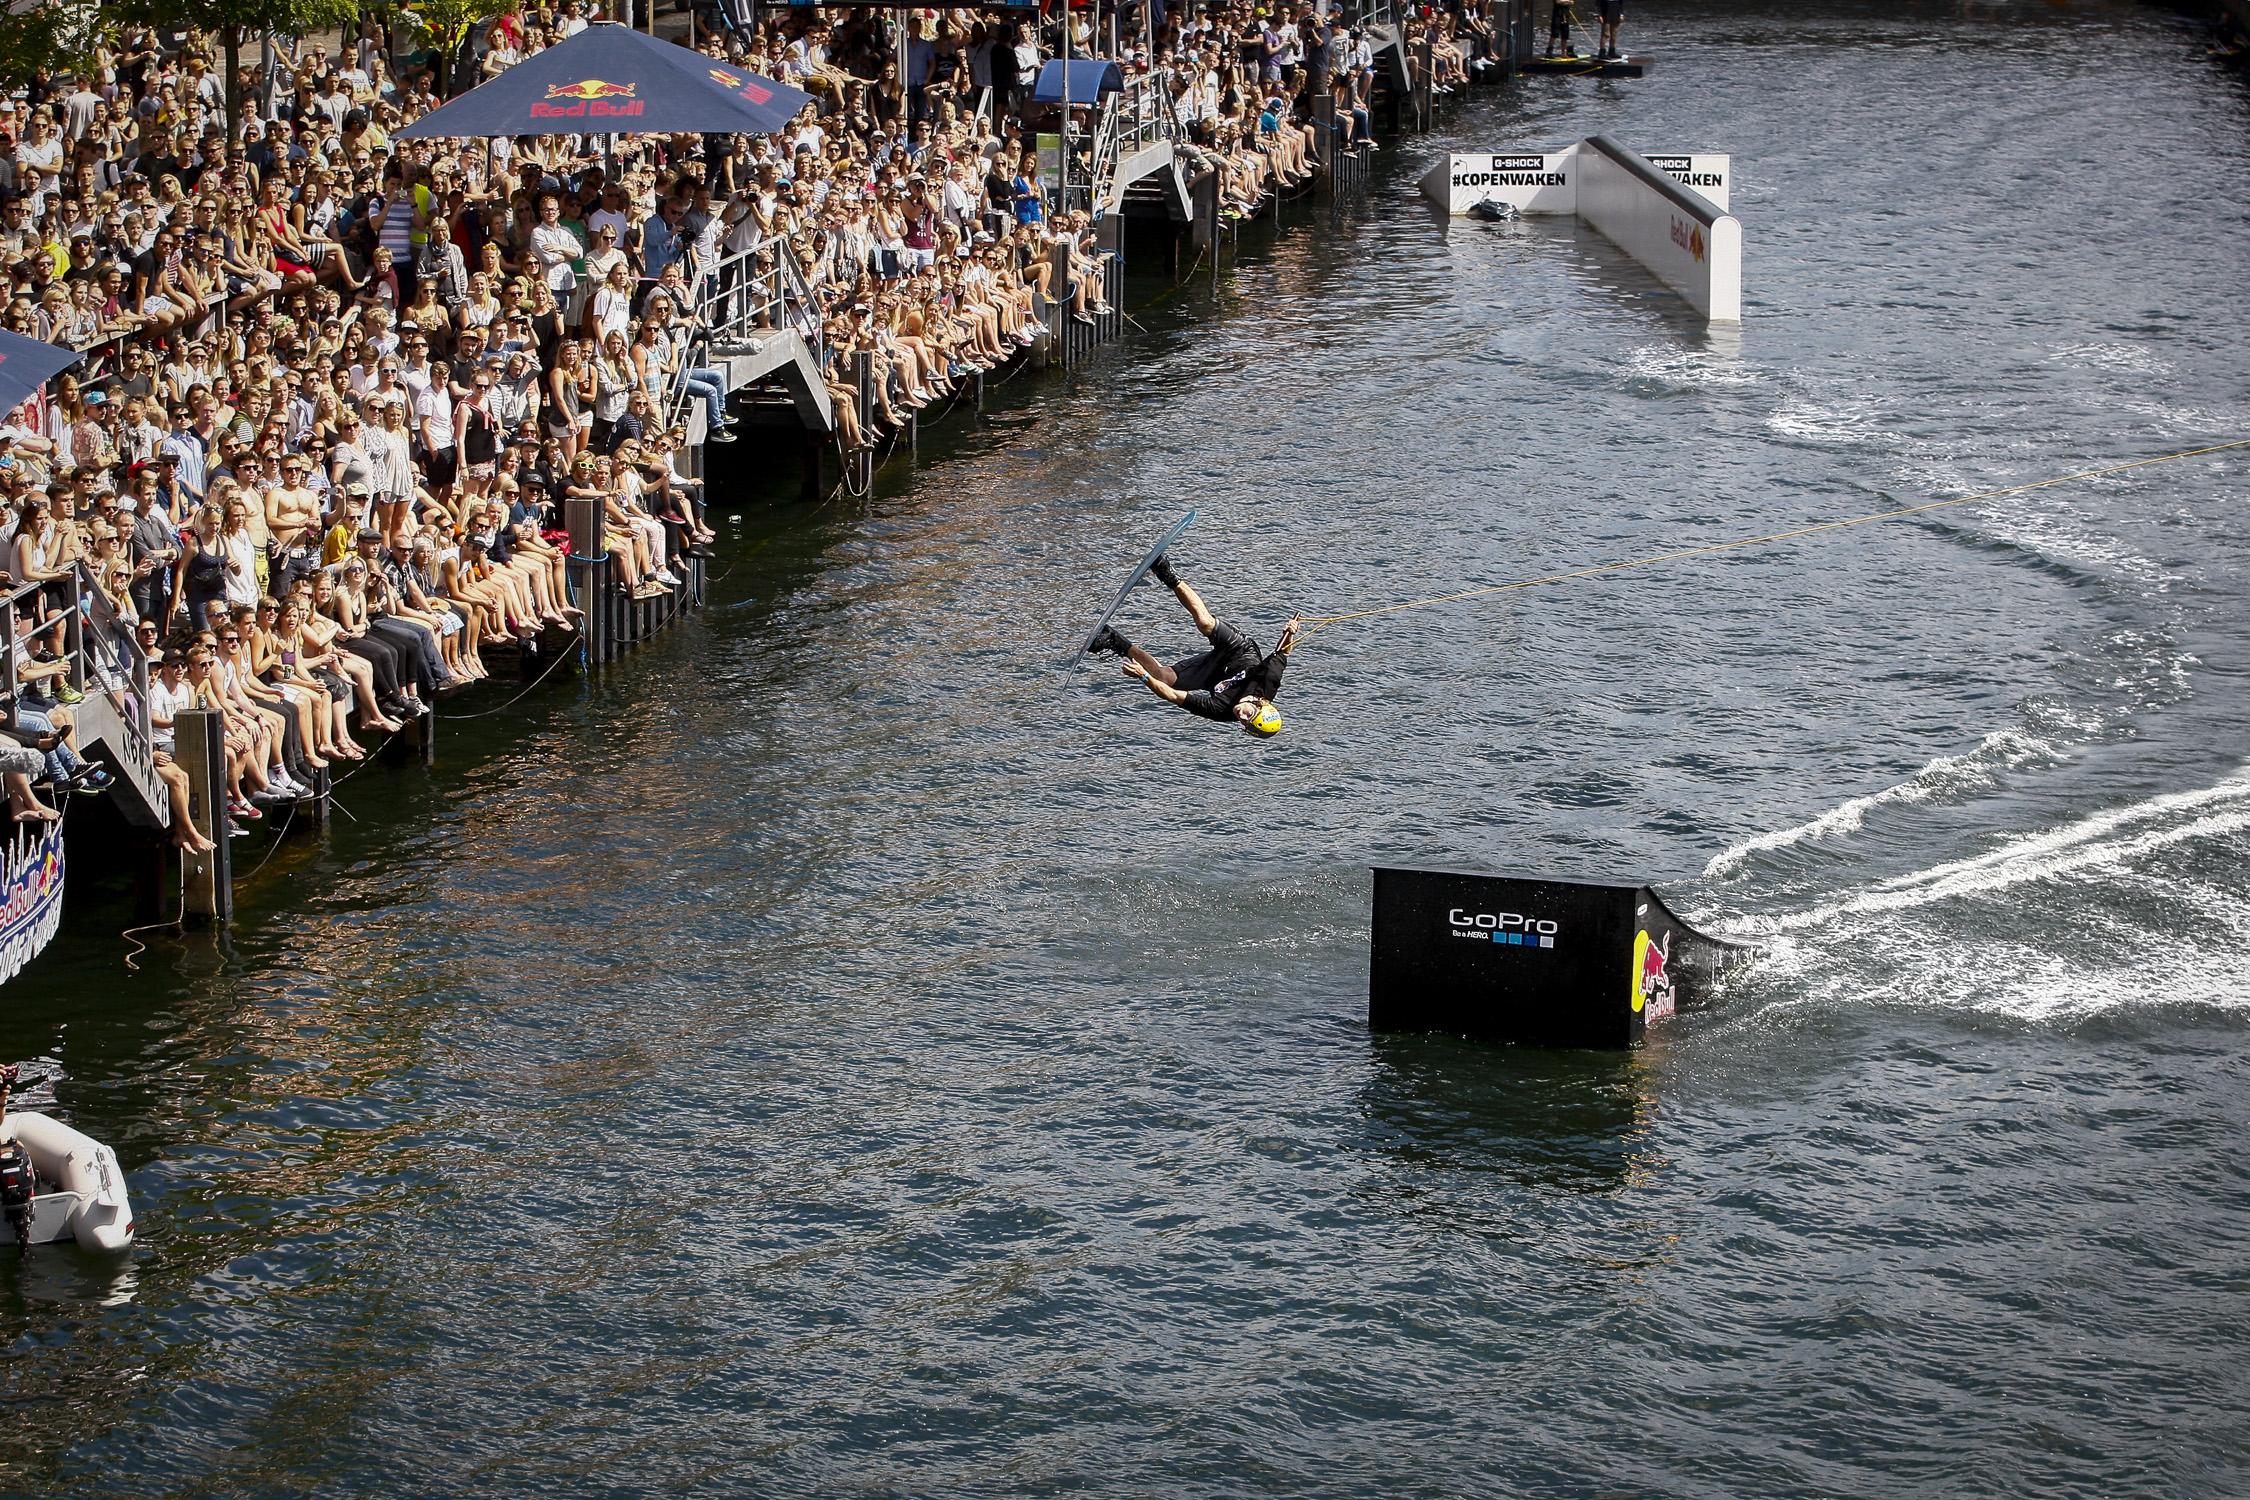 Wakeboard – Red Bull – Cope'n'waken 2014